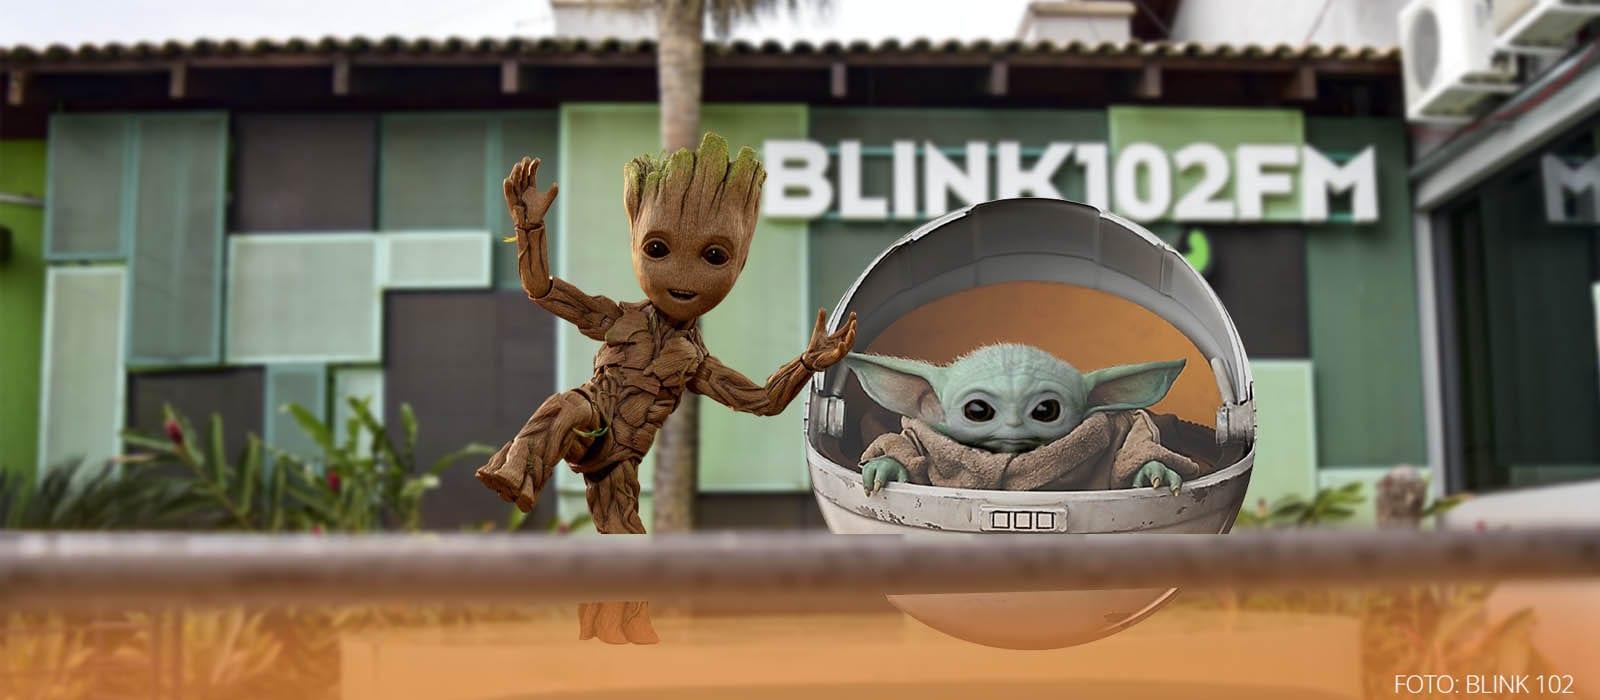 Sua torcida vai para quem, Baby Groot ou Baby Yoda?